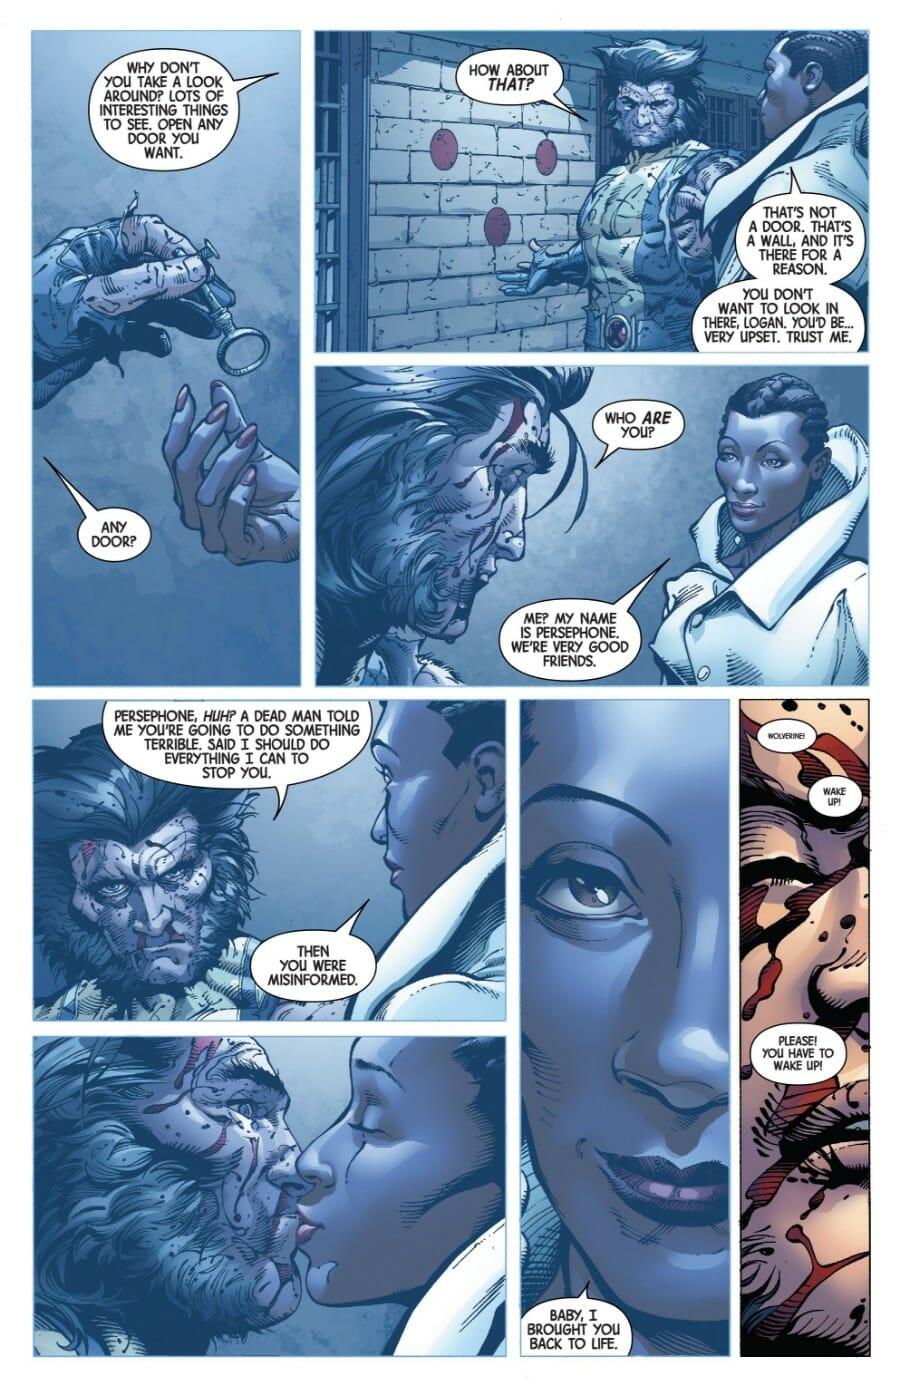 47b8d44253d Return Of Wolverine 1-6 - Comic Book Revolution